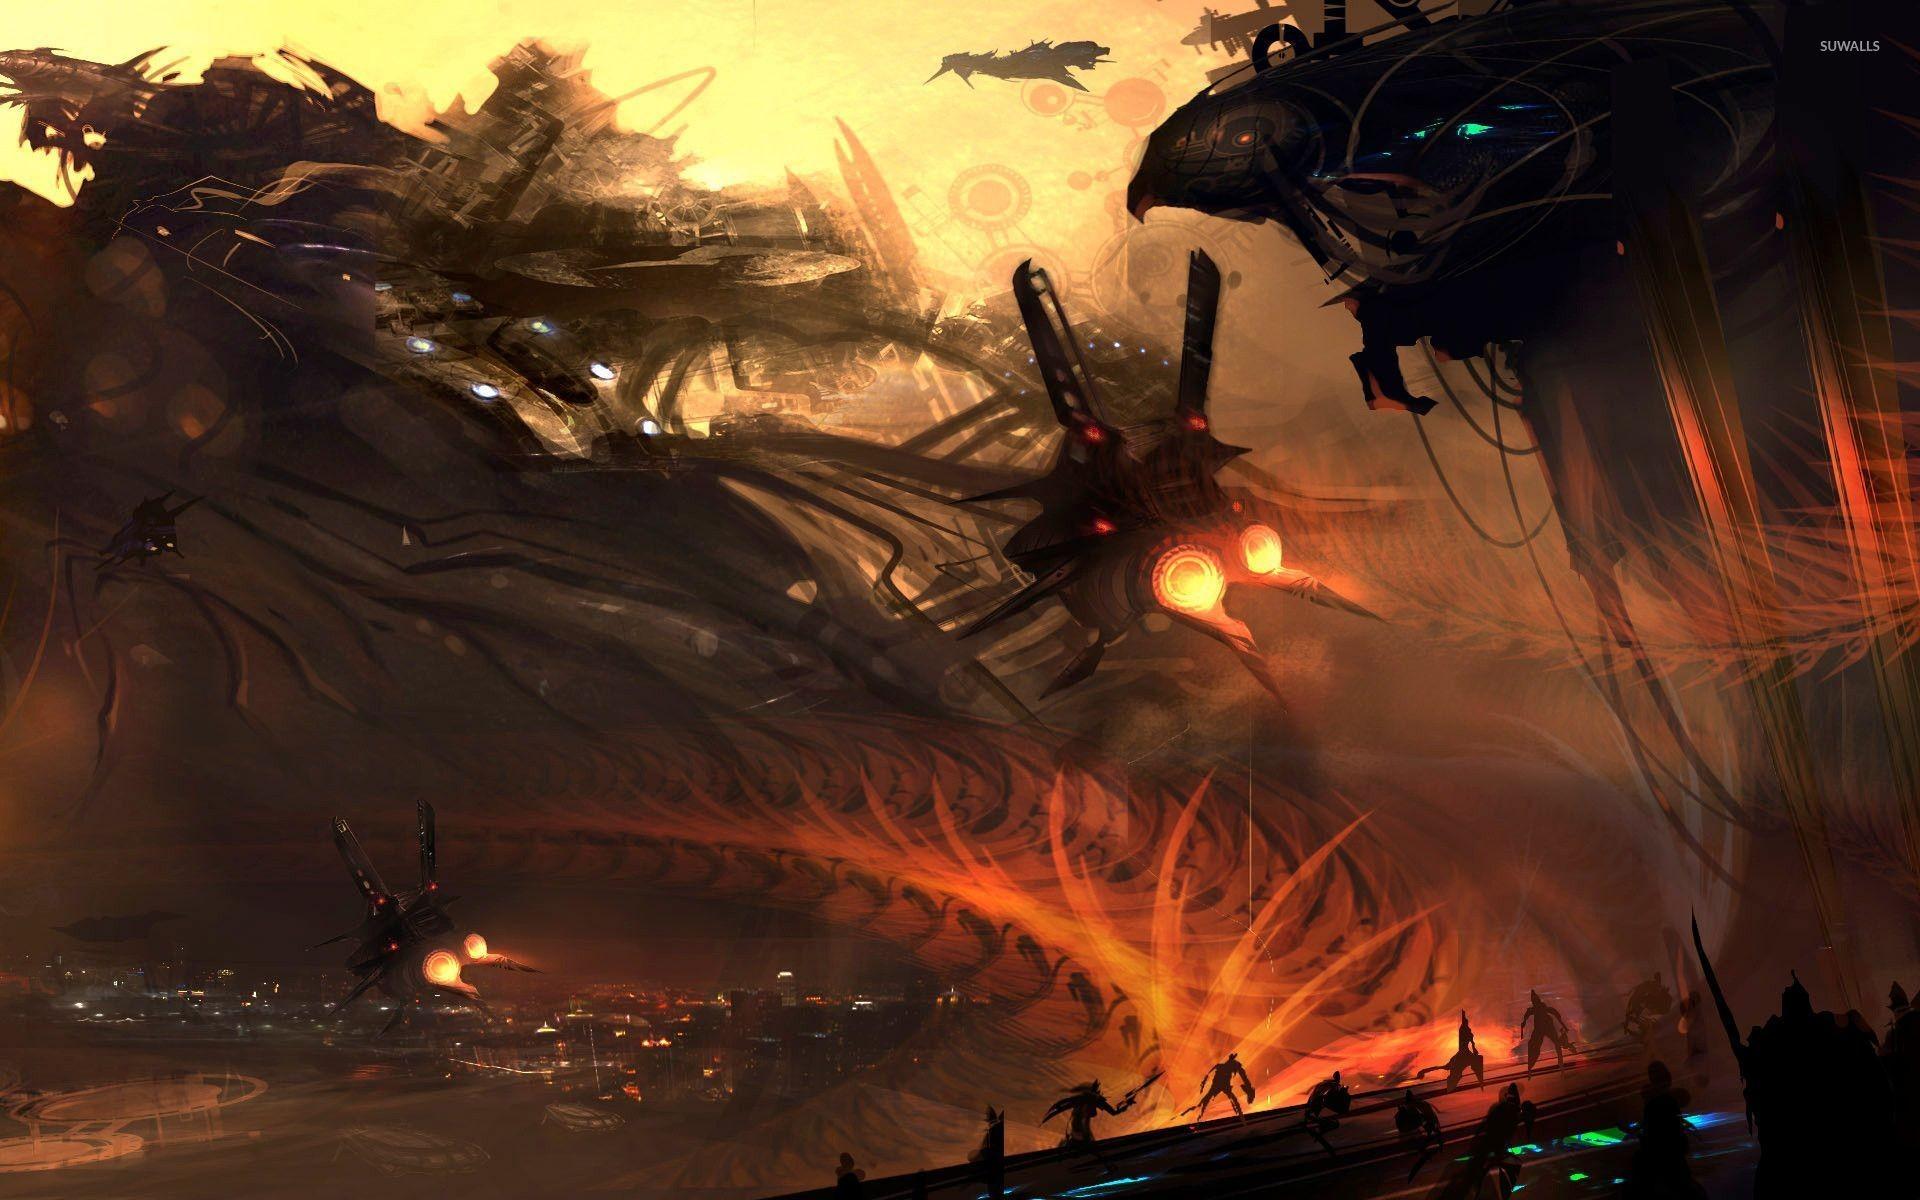 Space battle [2] wallpaper